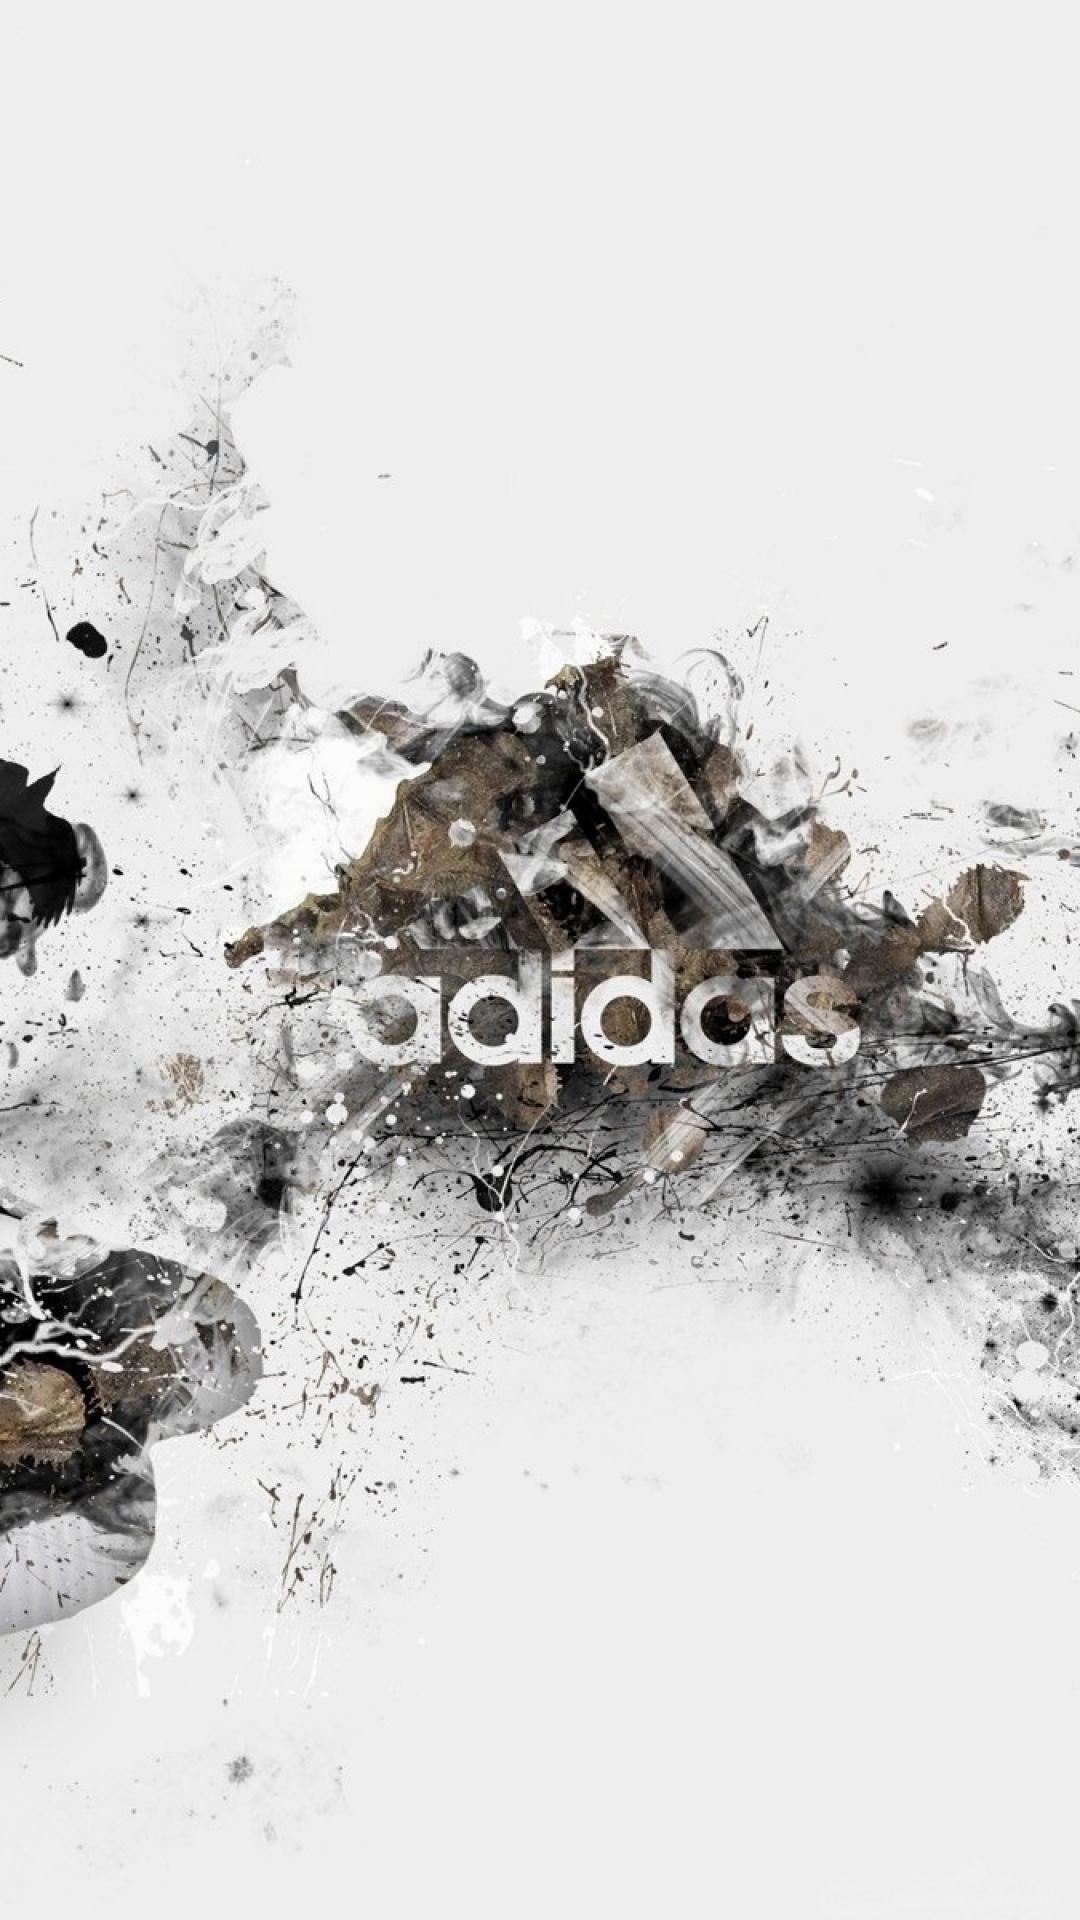 wallpaper.wiki-Adidas-Iphone-Sneakers-Stylish-Brand-Wallpaper-